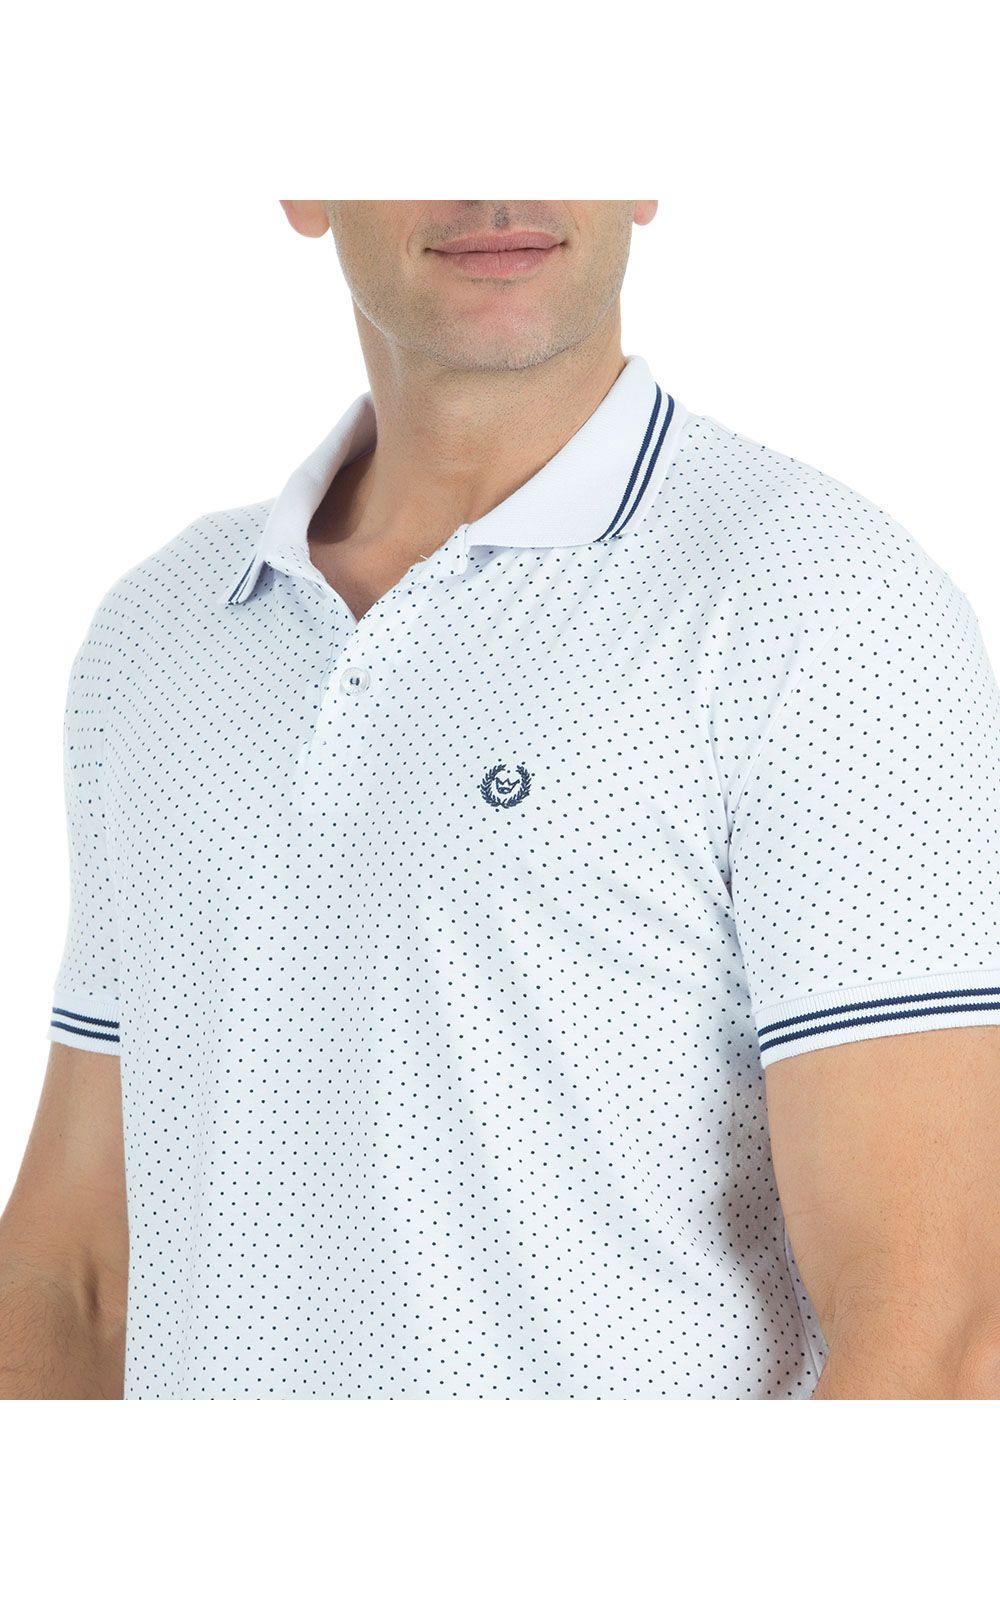 ... Foto 3 - Camisa Polo Masculina Estampada Branca ... 0b55f108bf86c